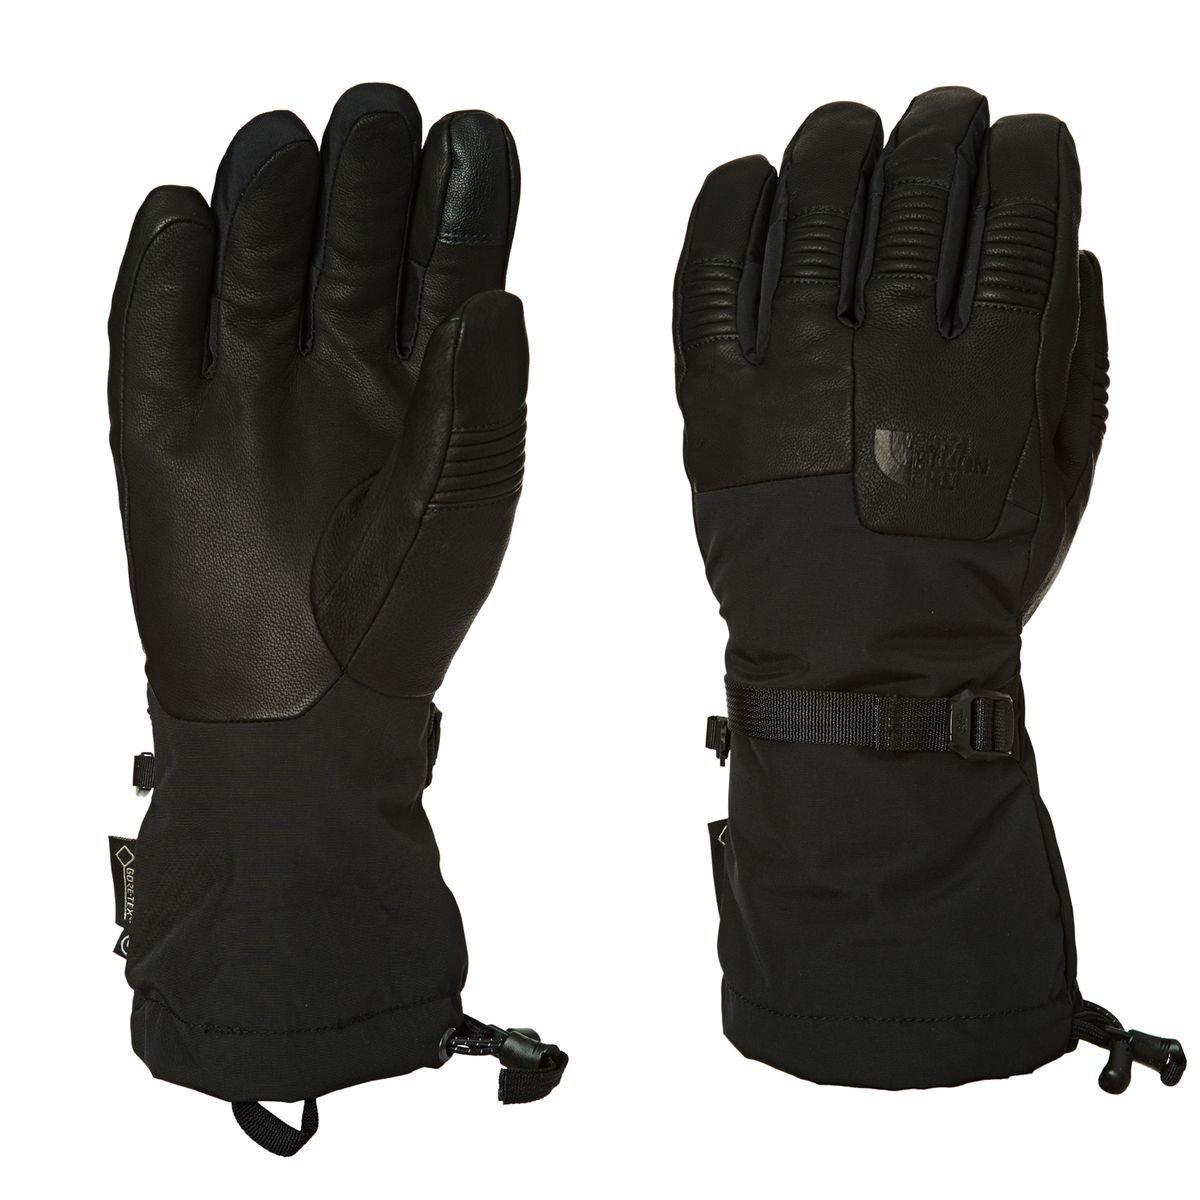 The North Face Powdercloud Gore-Tex Glove Tnf Black